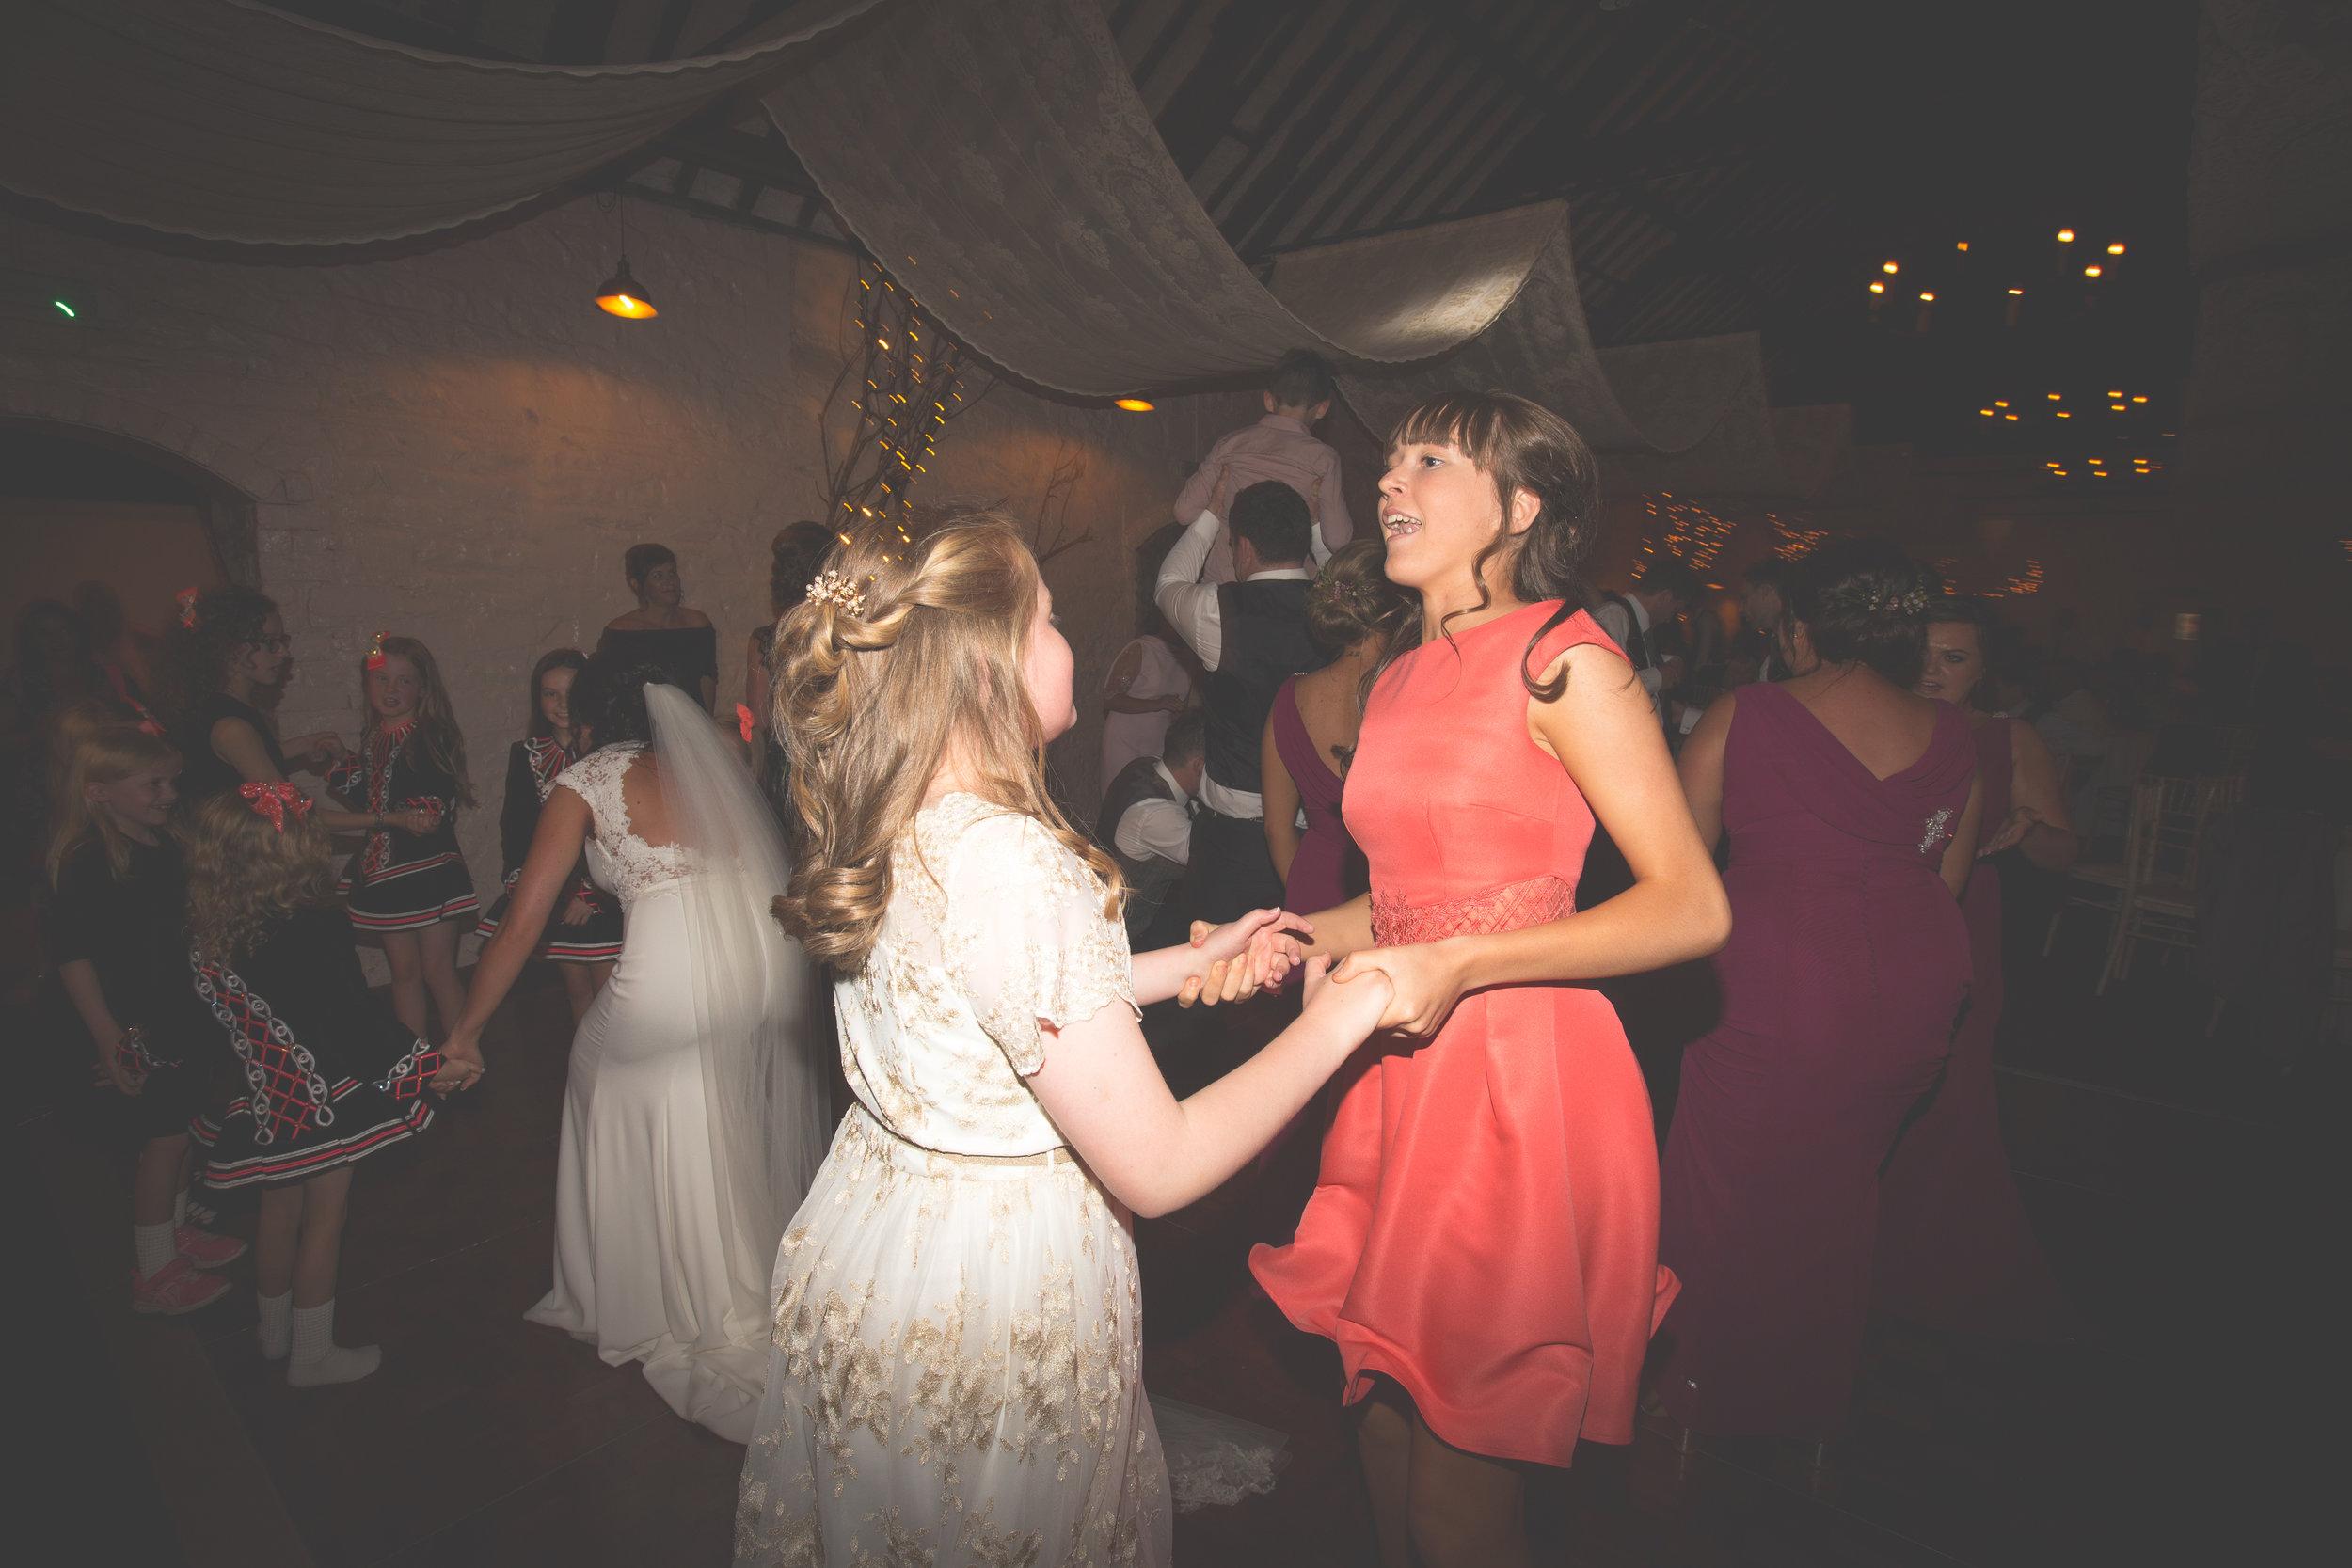 Brian McEwan Wedding Photography | Carol-Annee & Sean | The Dancing-70.jpg